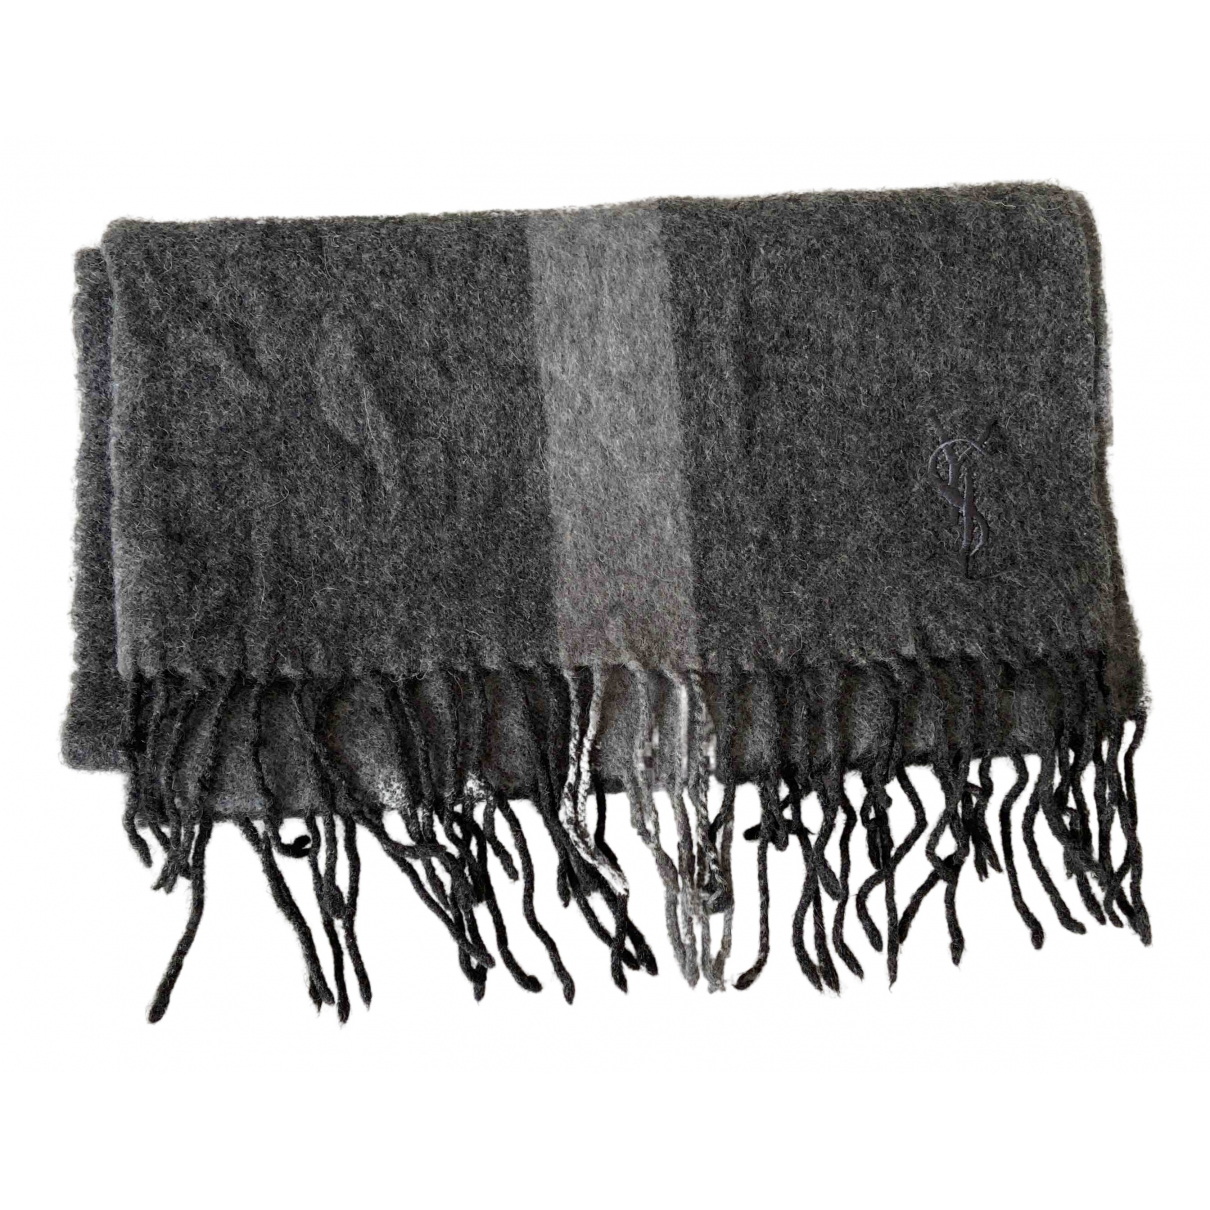 Yves Saint Laurent \N Tuecher, Schal in  Grau Wolle